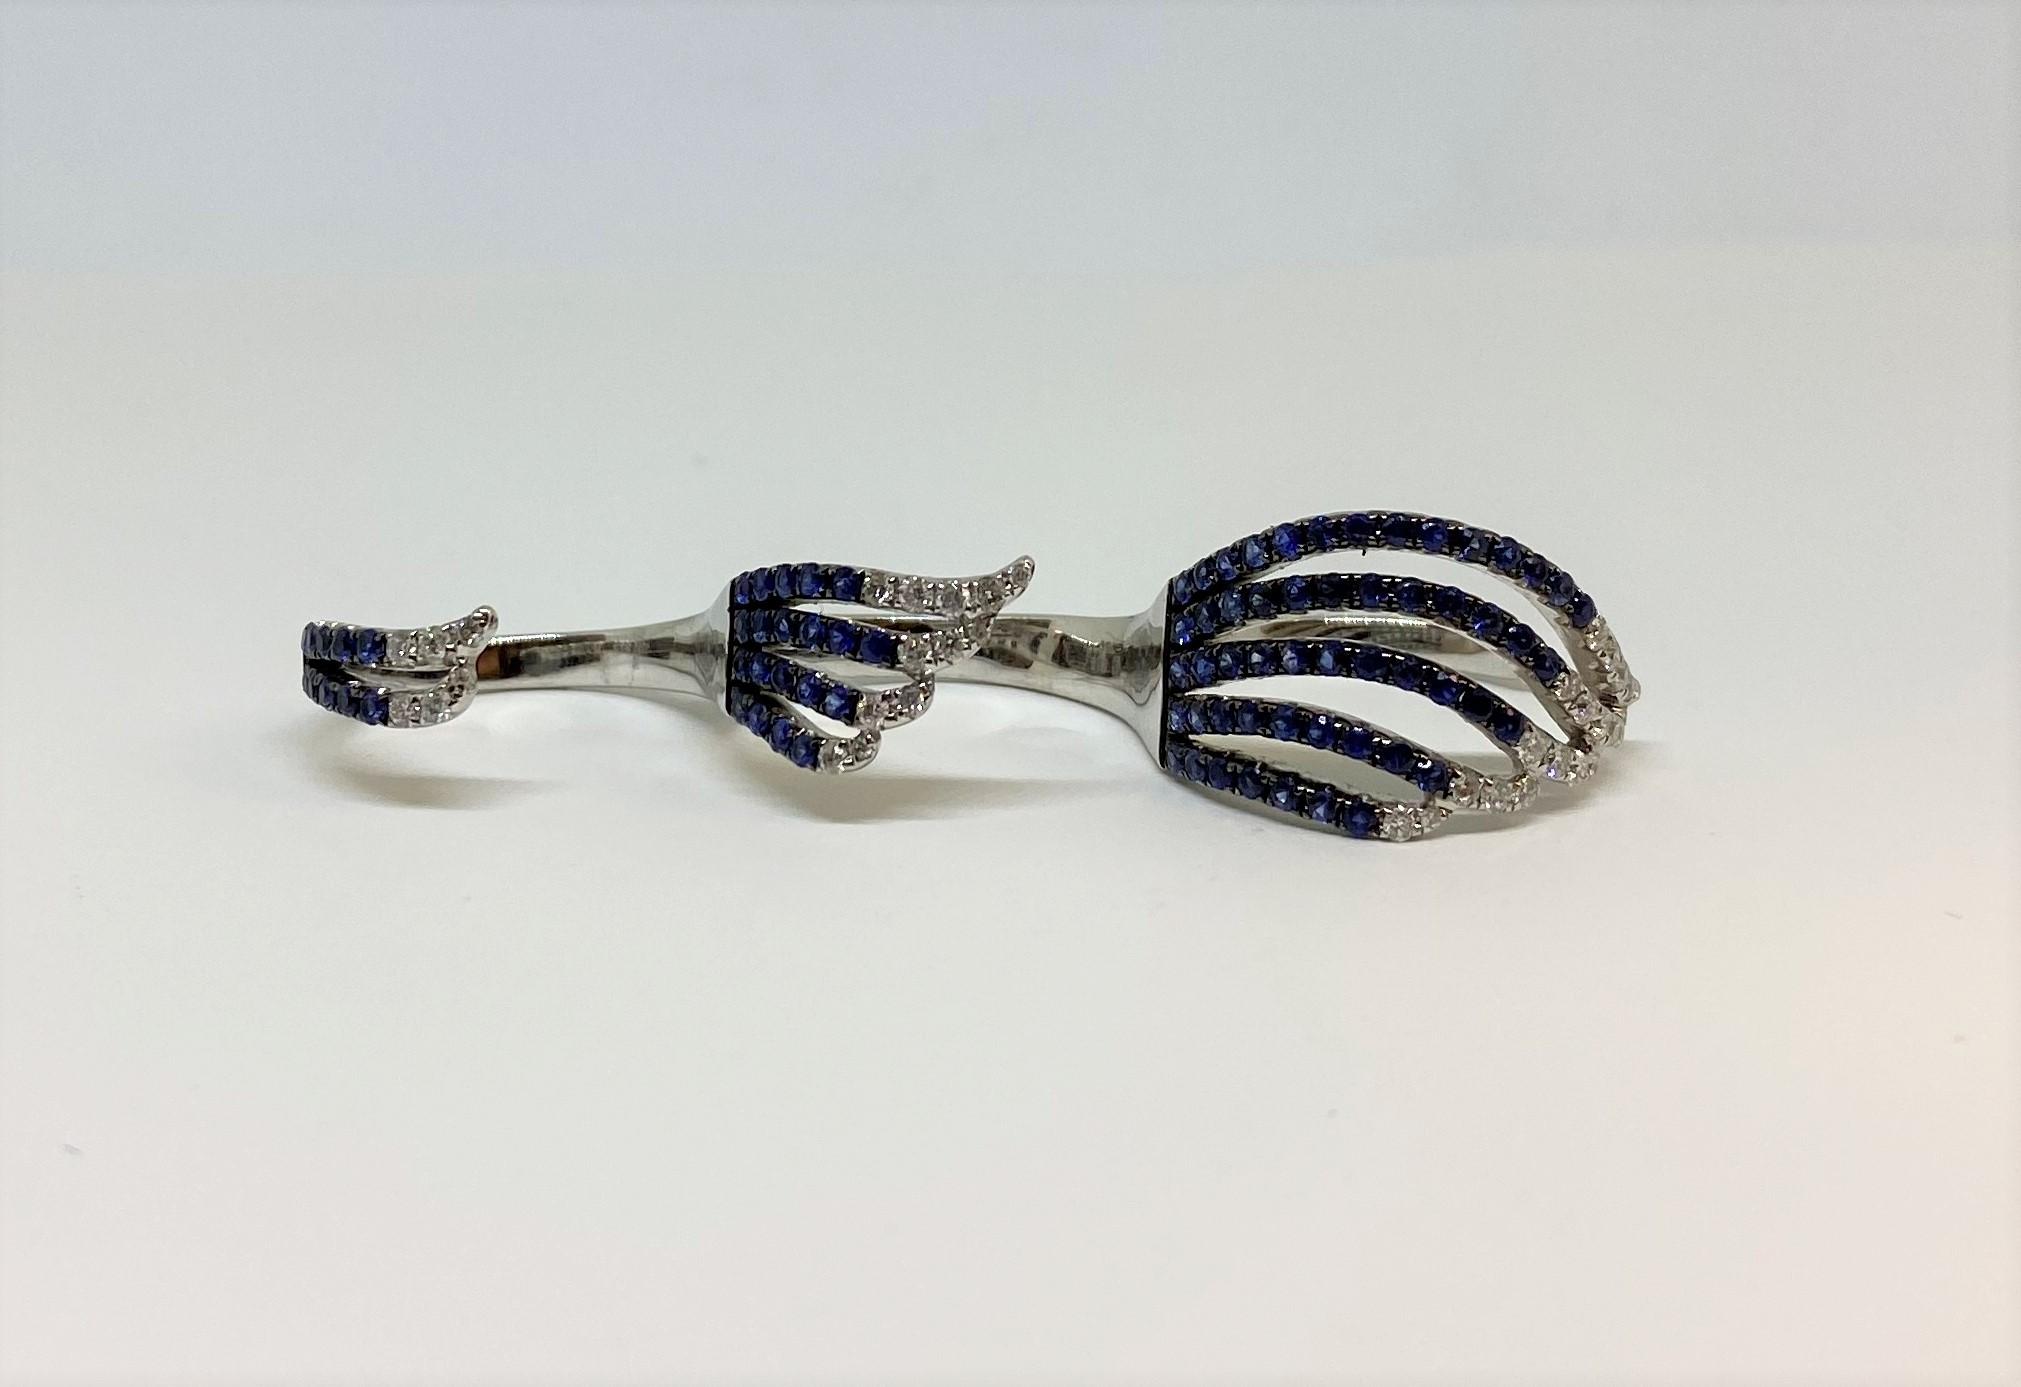 1 Carat Sapphire 3-Finger Ring